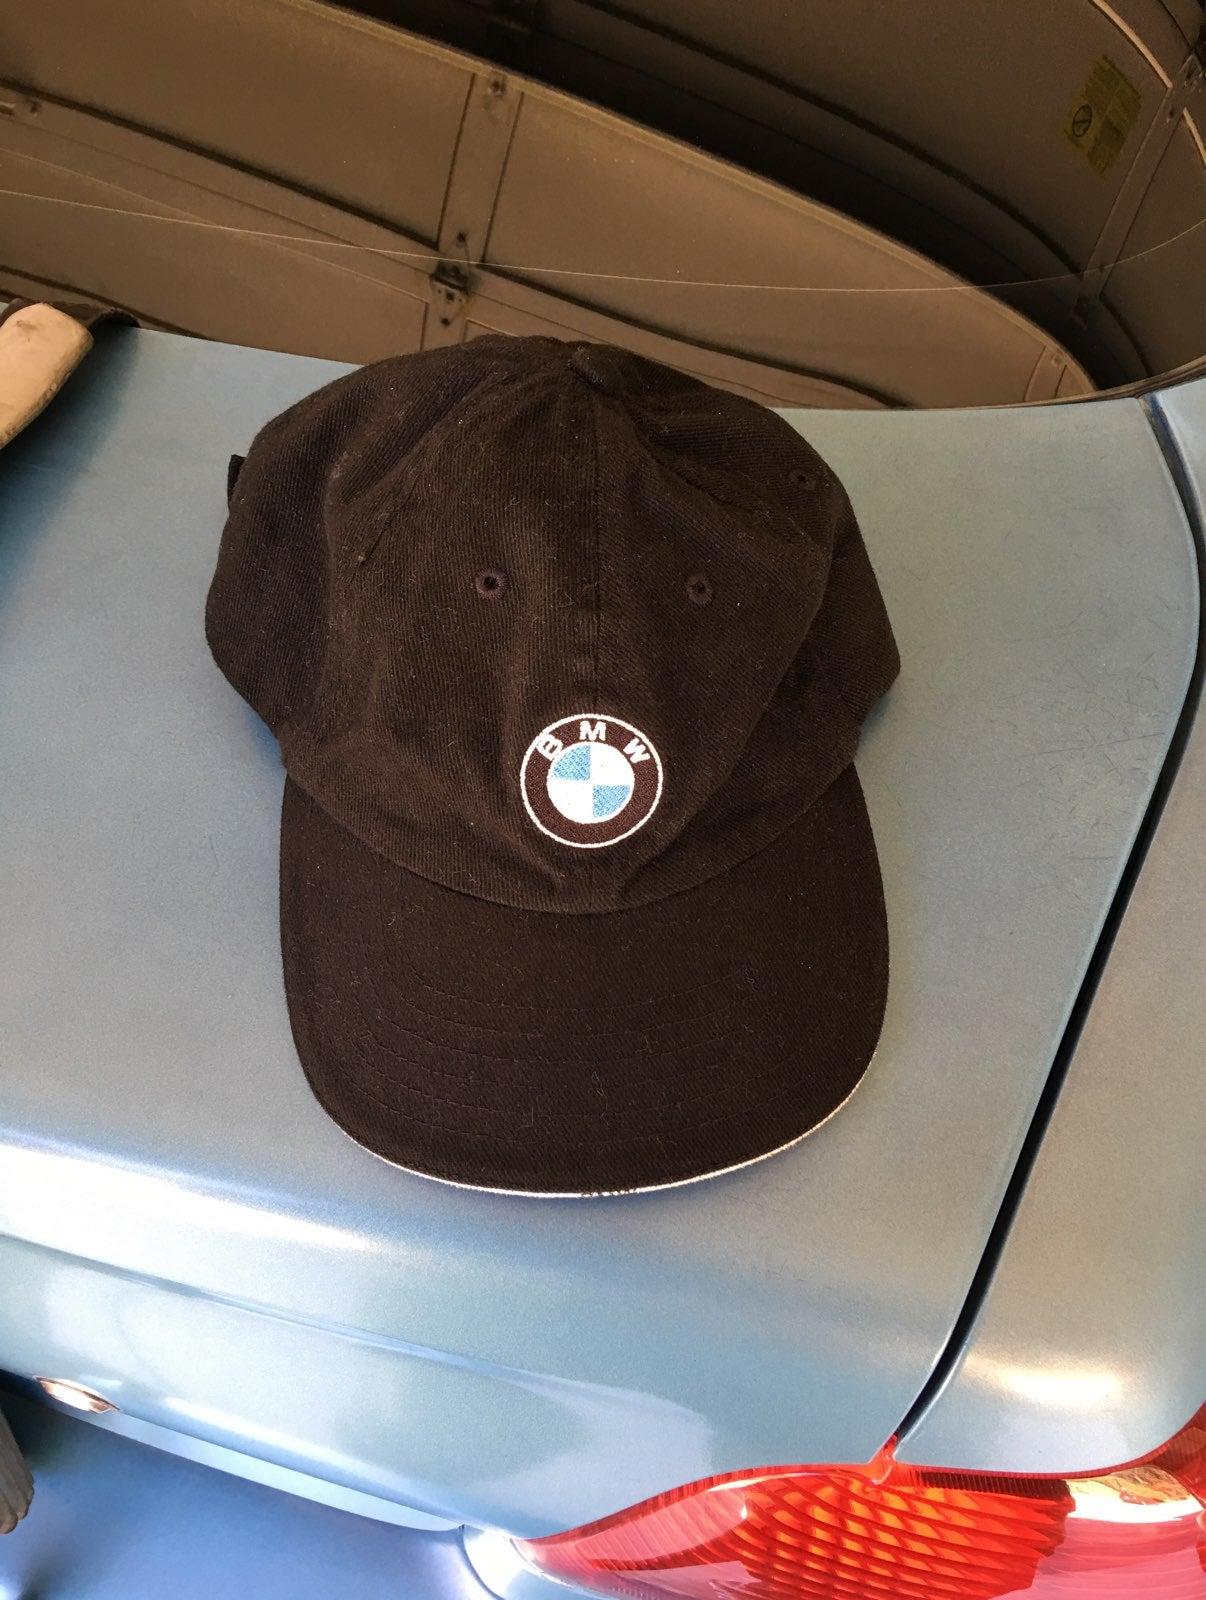 BMW LIFESTYLE baseball Dads Cap Hat